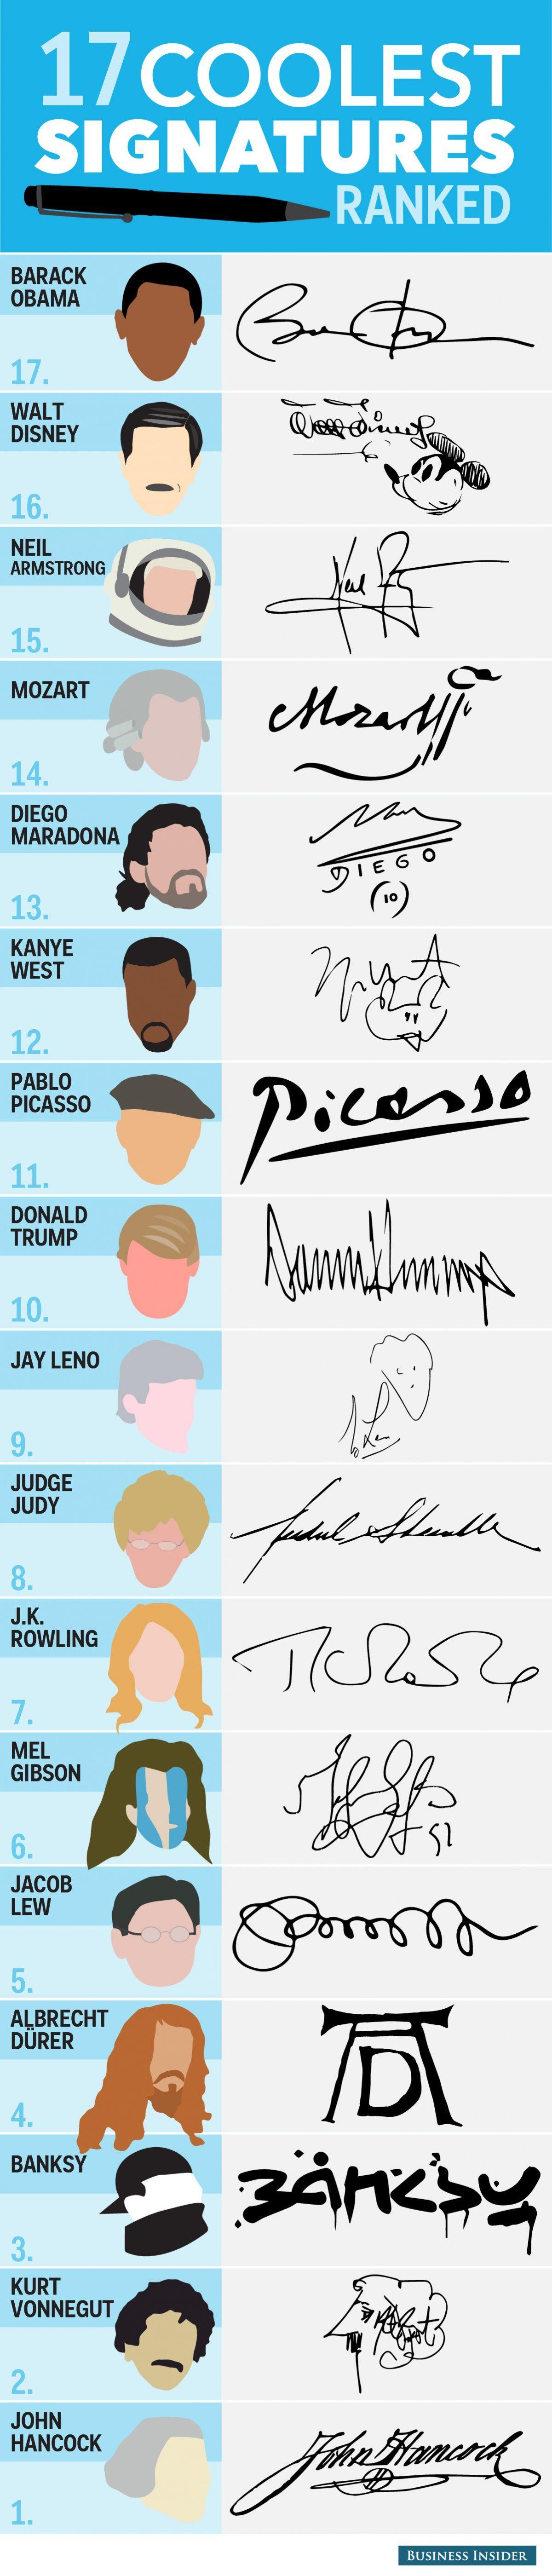 kända autografer